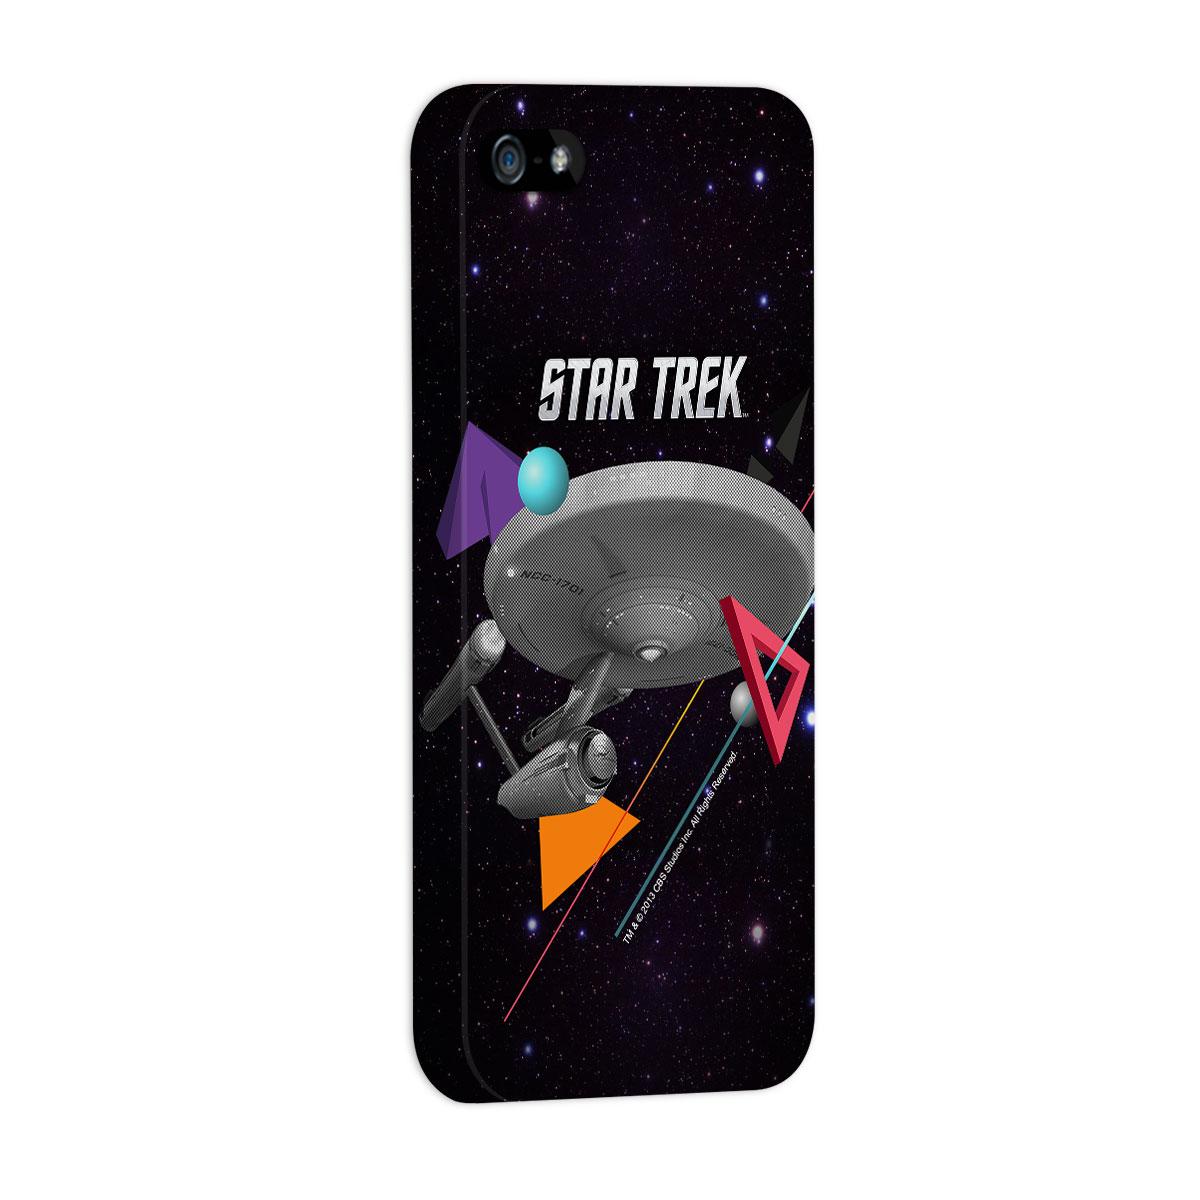 Capa de iPhone 5/5S Star Trek Enterprise